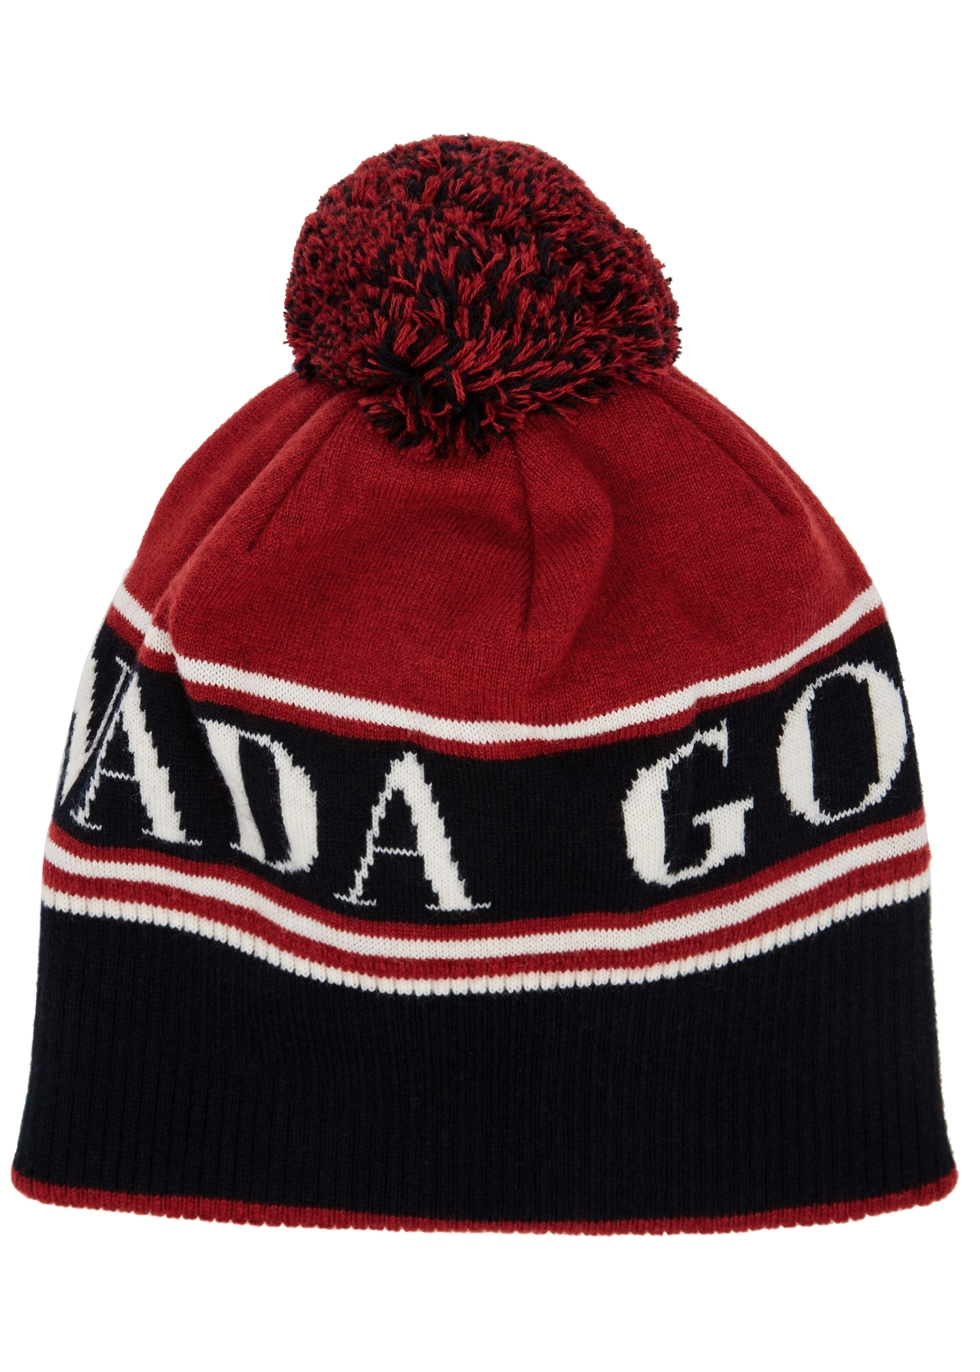 09631732cc2 Designer Beanies - Women s Luxury Hats - Harvey Nichols